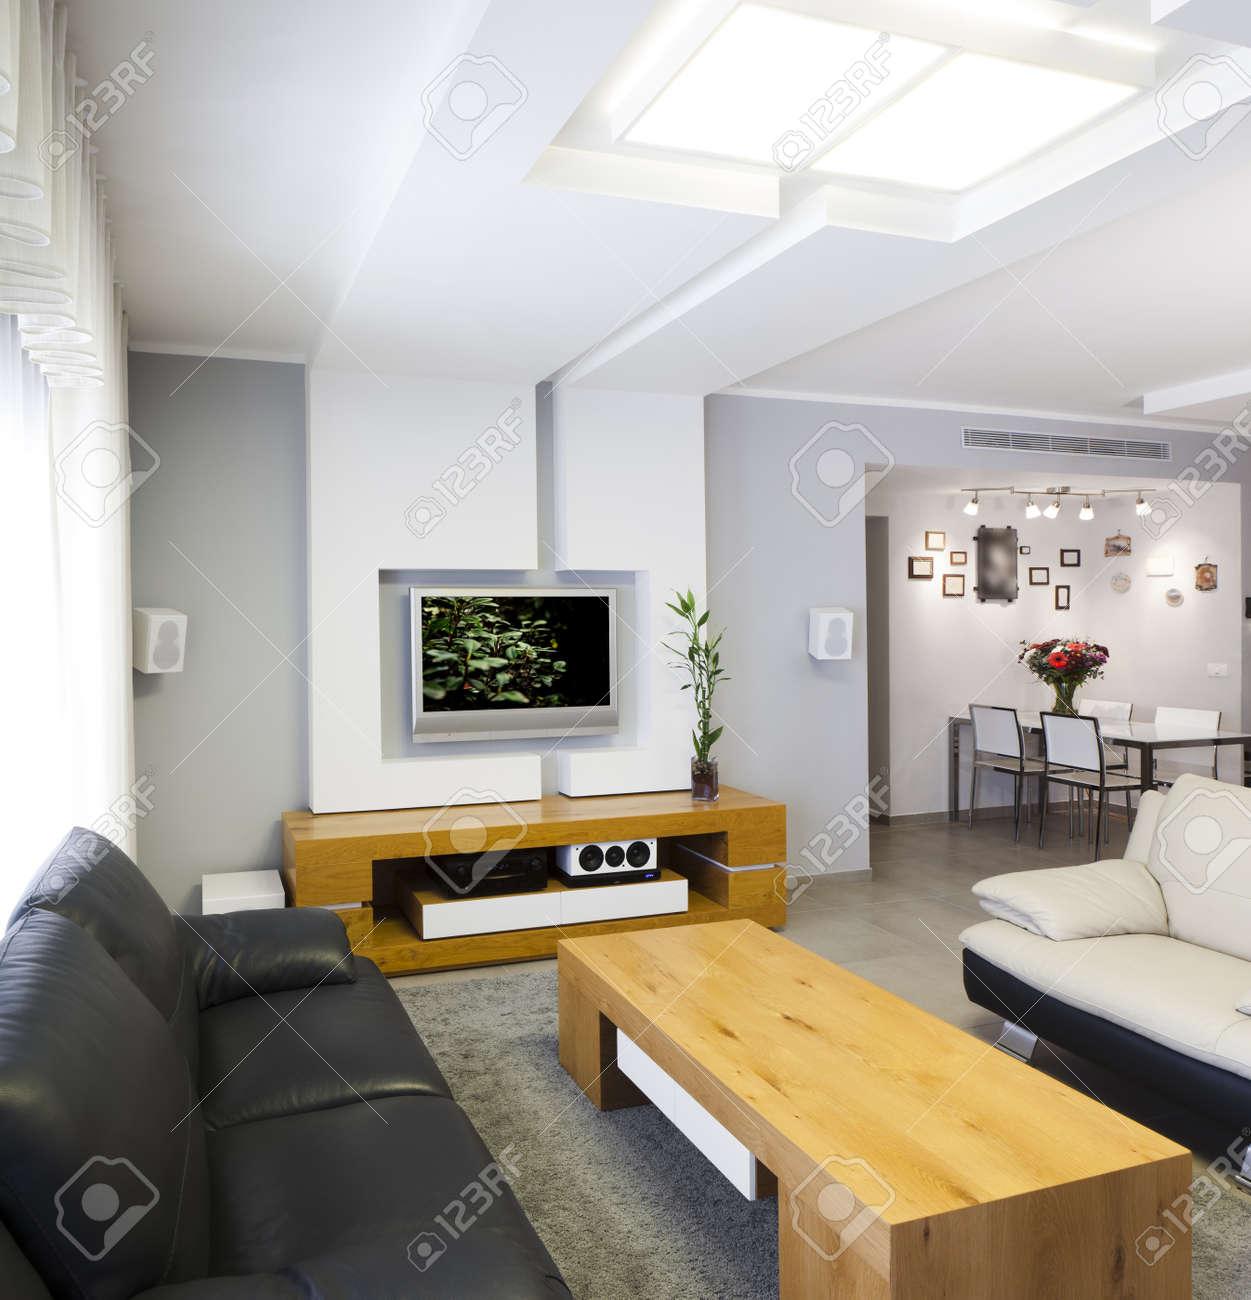 habitacin moderna con plasma tv nota a revisor imagen original en la pantalla del televisor fue